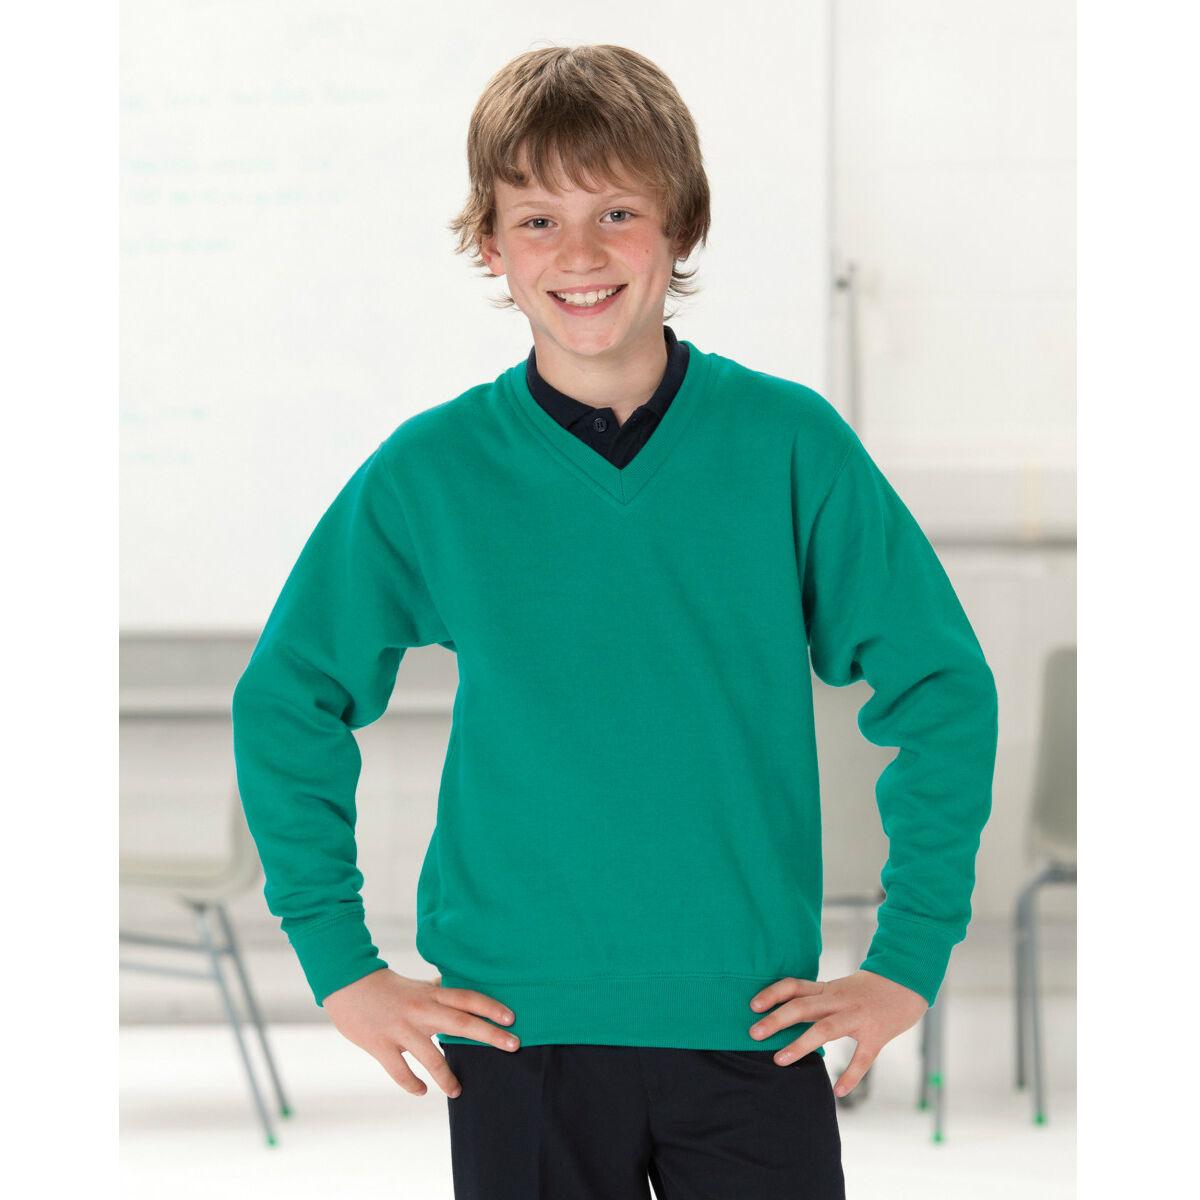 Russells Schoolgear V Neck Sweatshirt